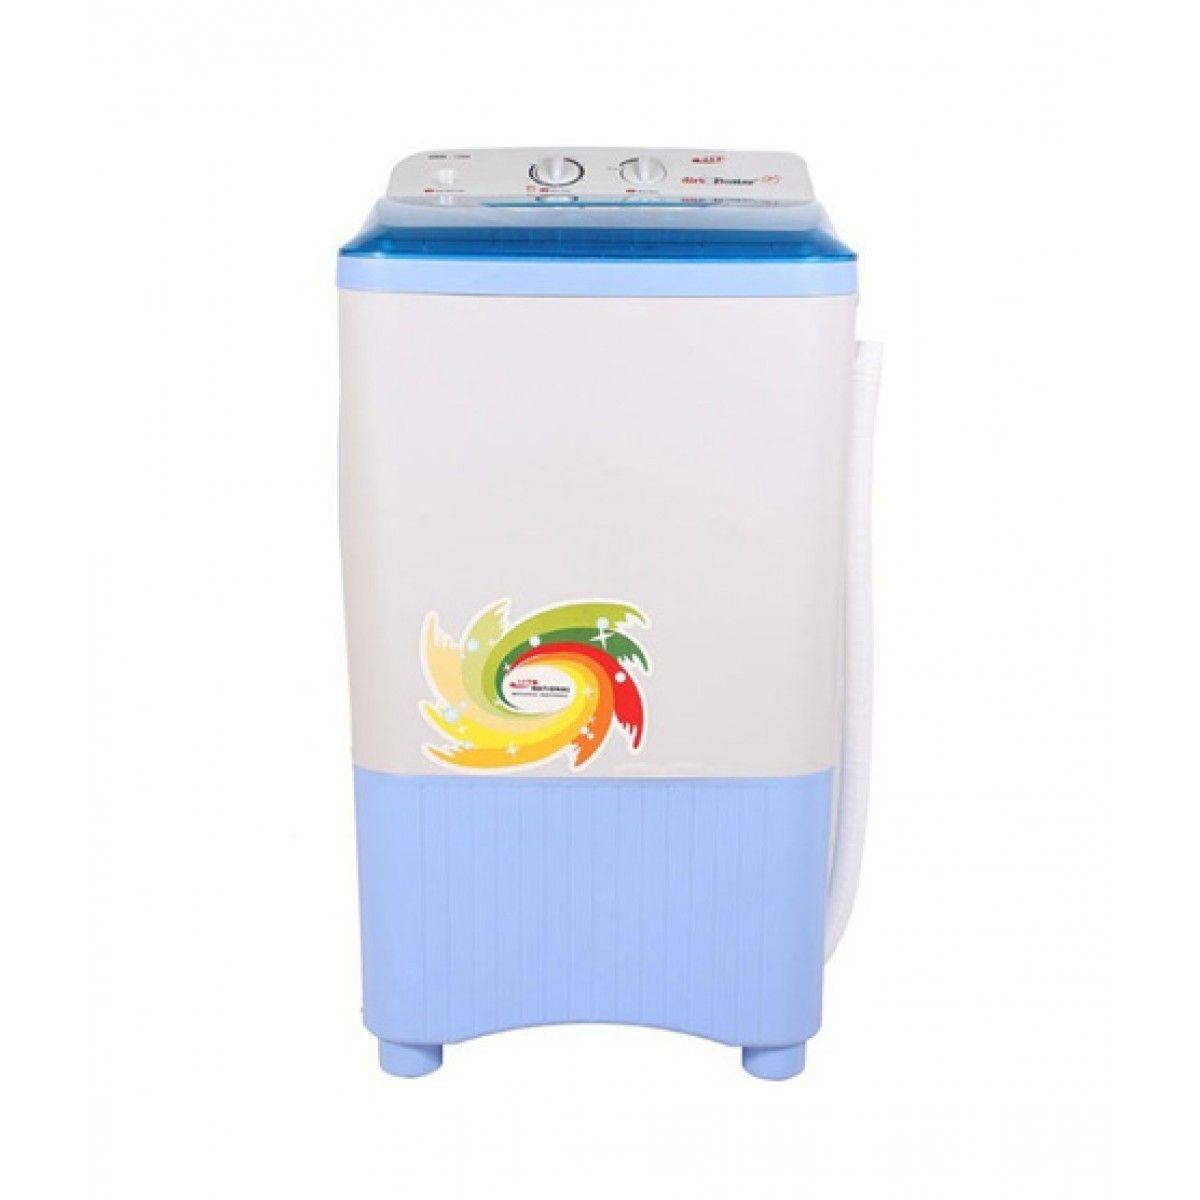 Gaba National GNW-1208-DLX Single Tub Washing Machine